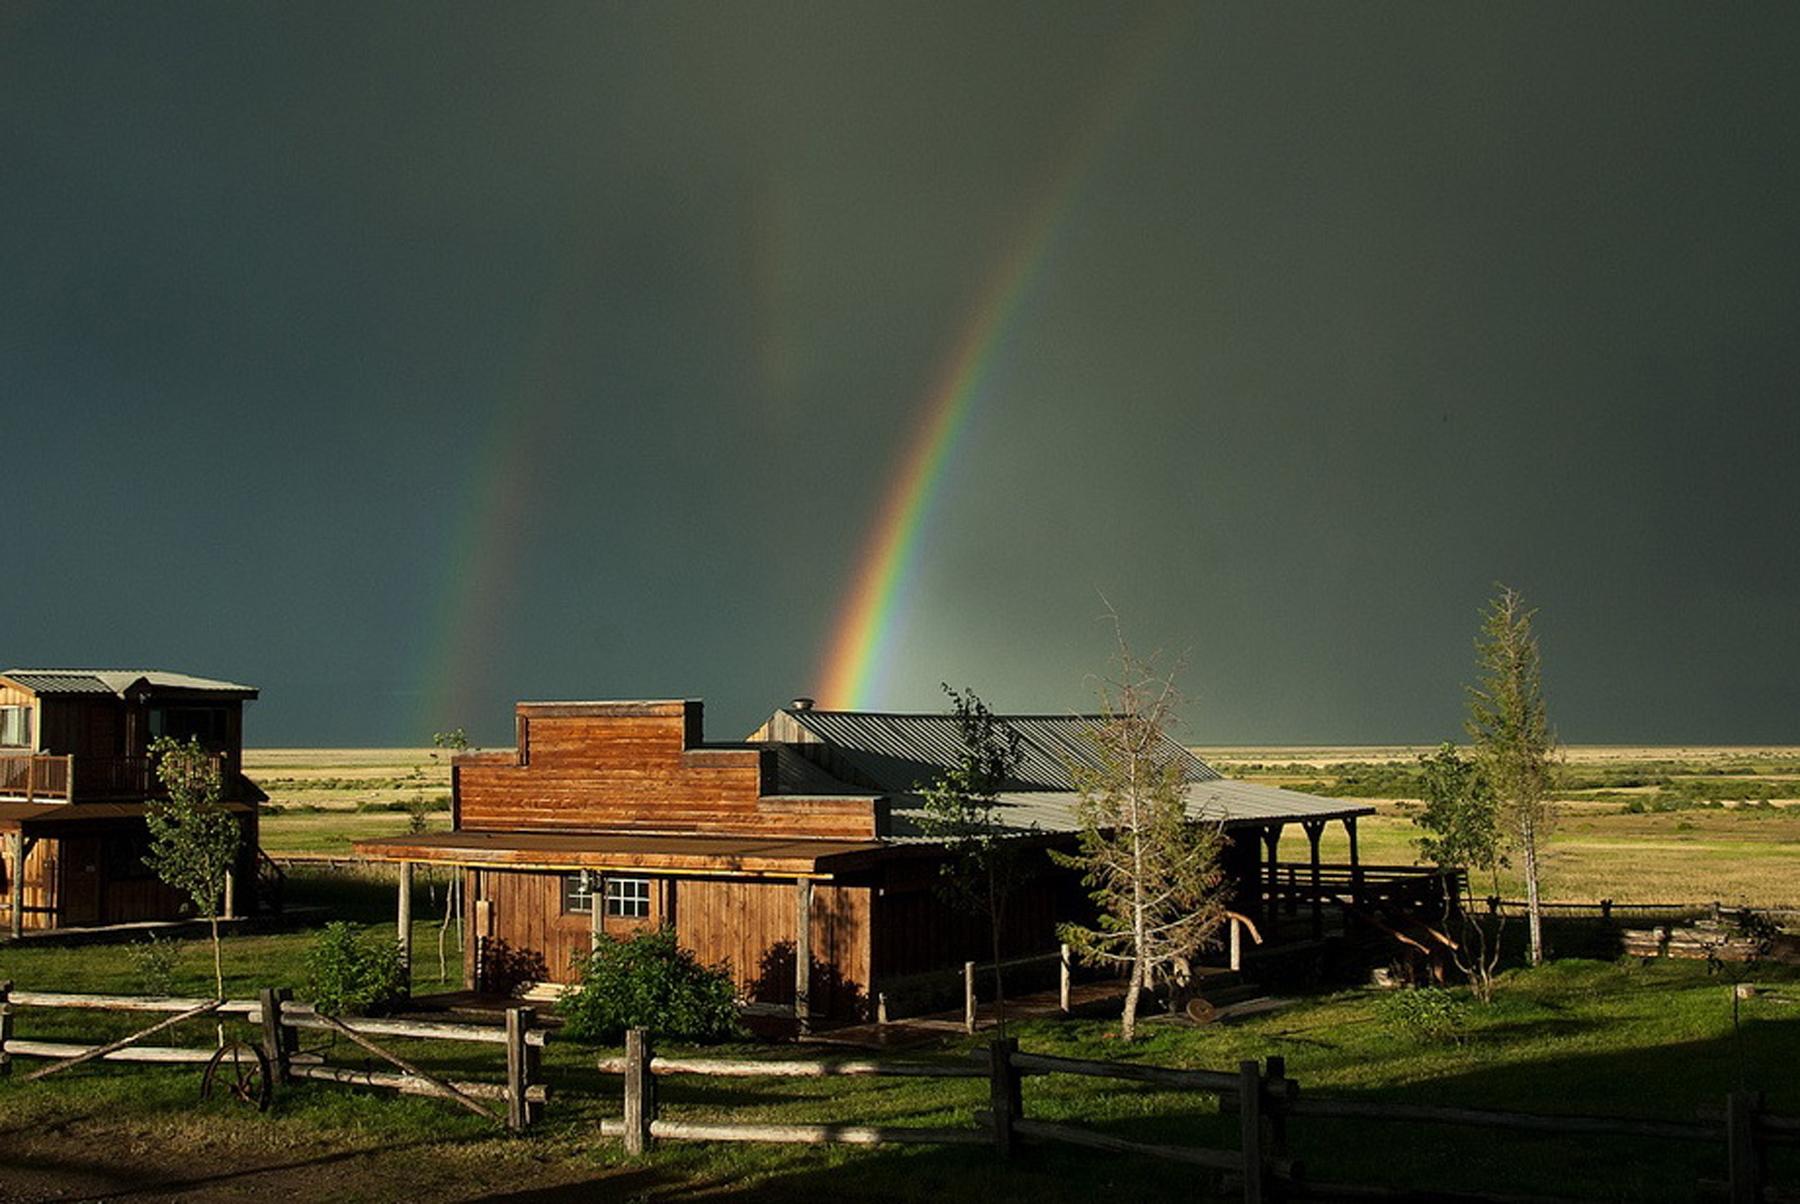 EHEC Evening rainbow at the Center.